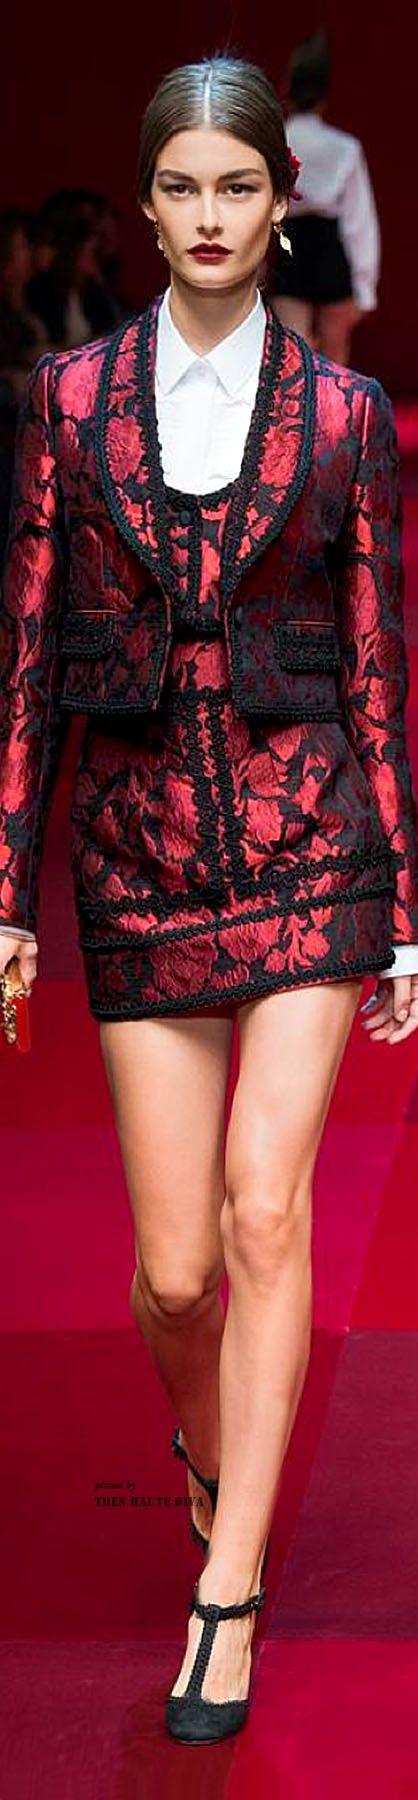 Dolce & Gabbana Spring Summer 2015 ♔ Très Haute Diva